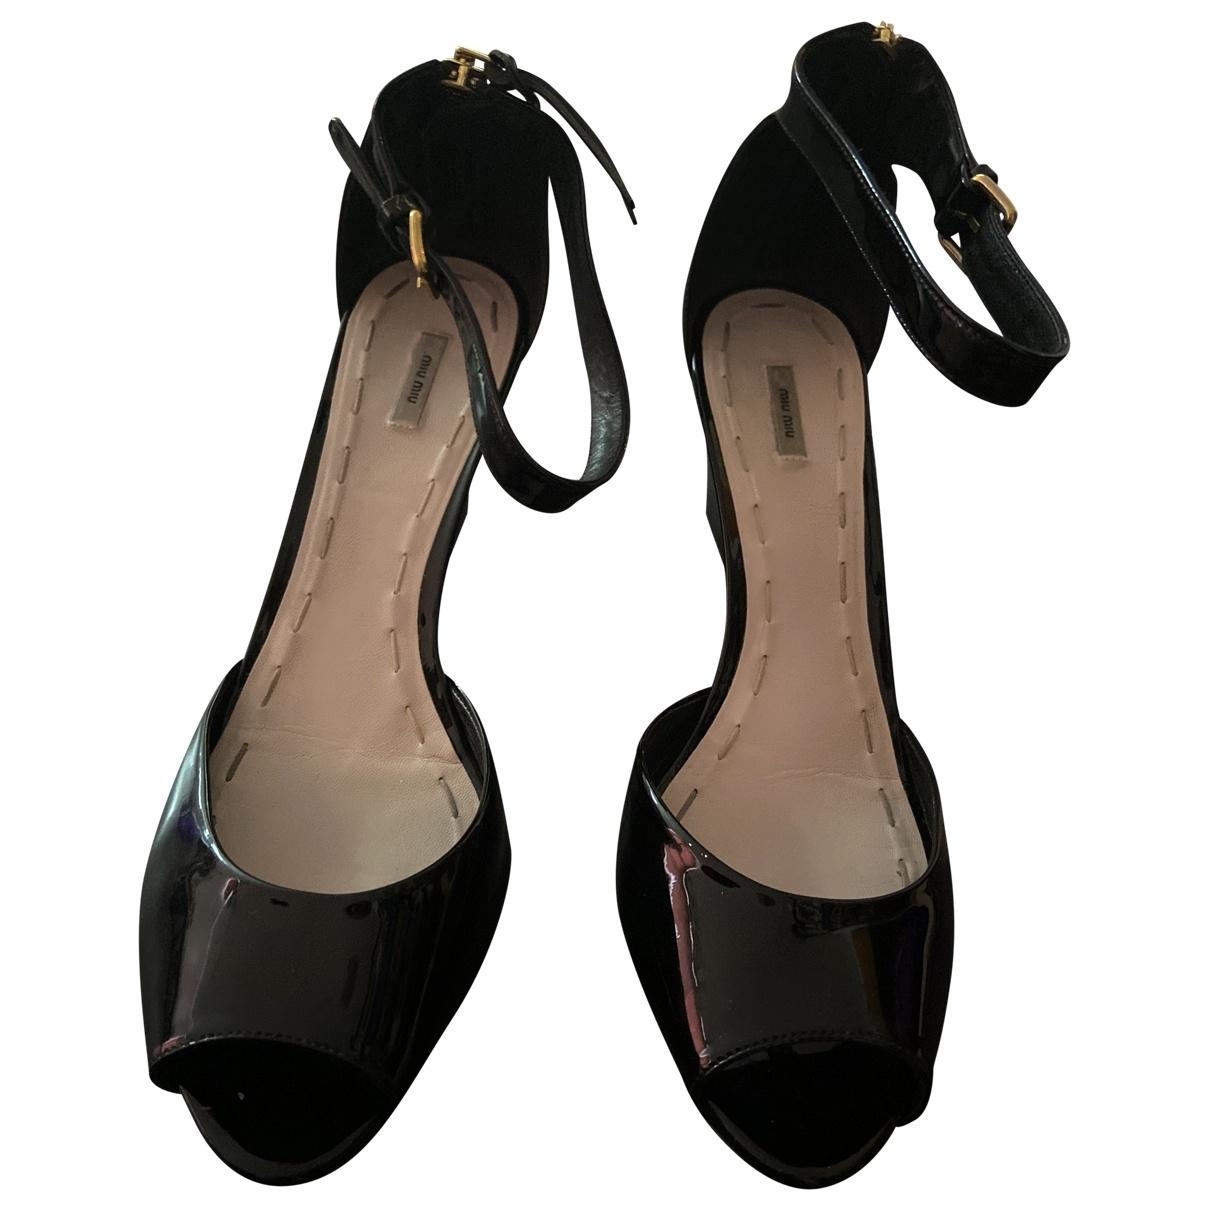 Sandalias de Charol Miu Miu